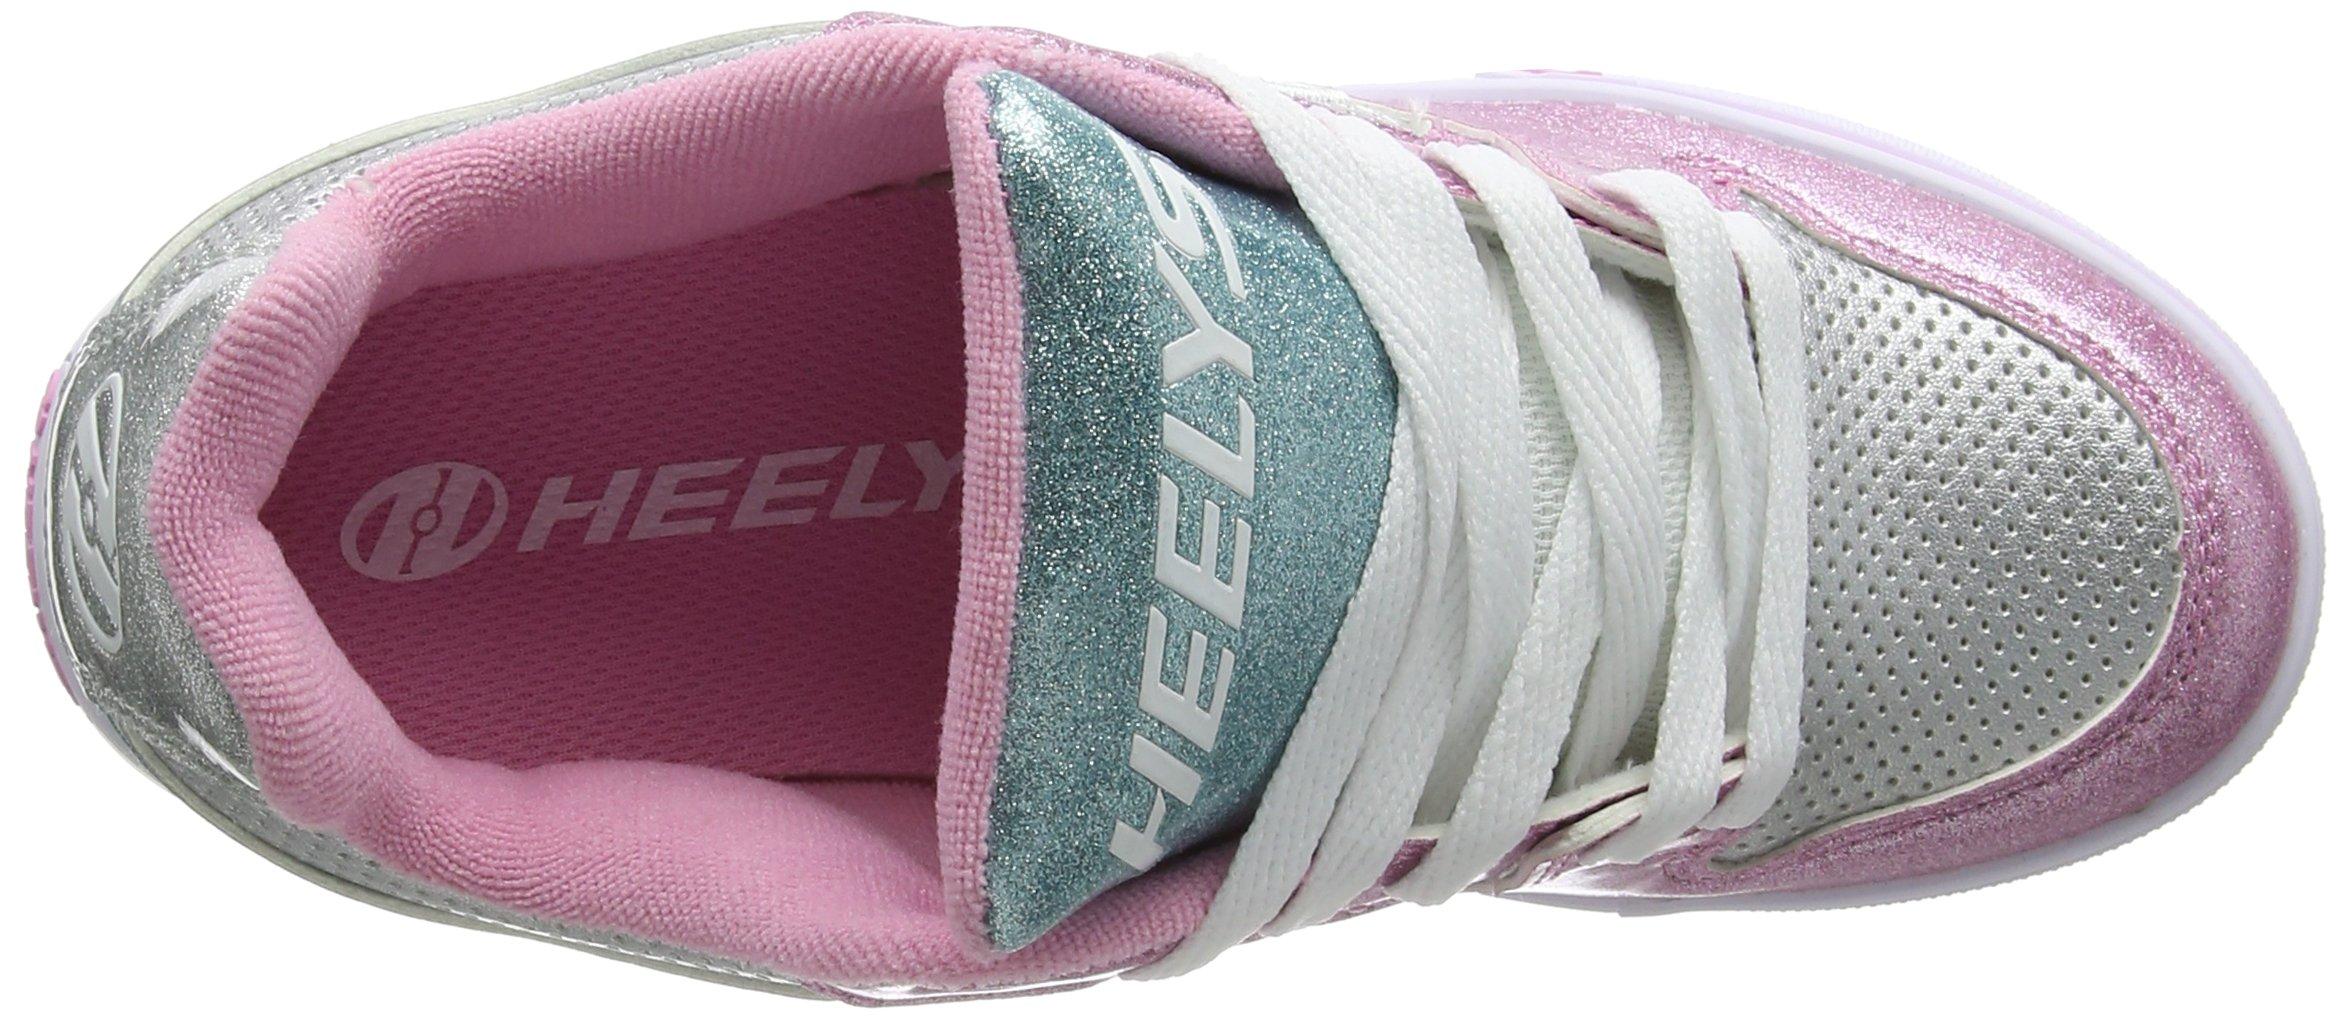 Heelys Girl's Motion Plus (Little Kid/Big Kid/Adult) Silver/Pink/Blue/Glitter Shoe by Heelys (Image #7)